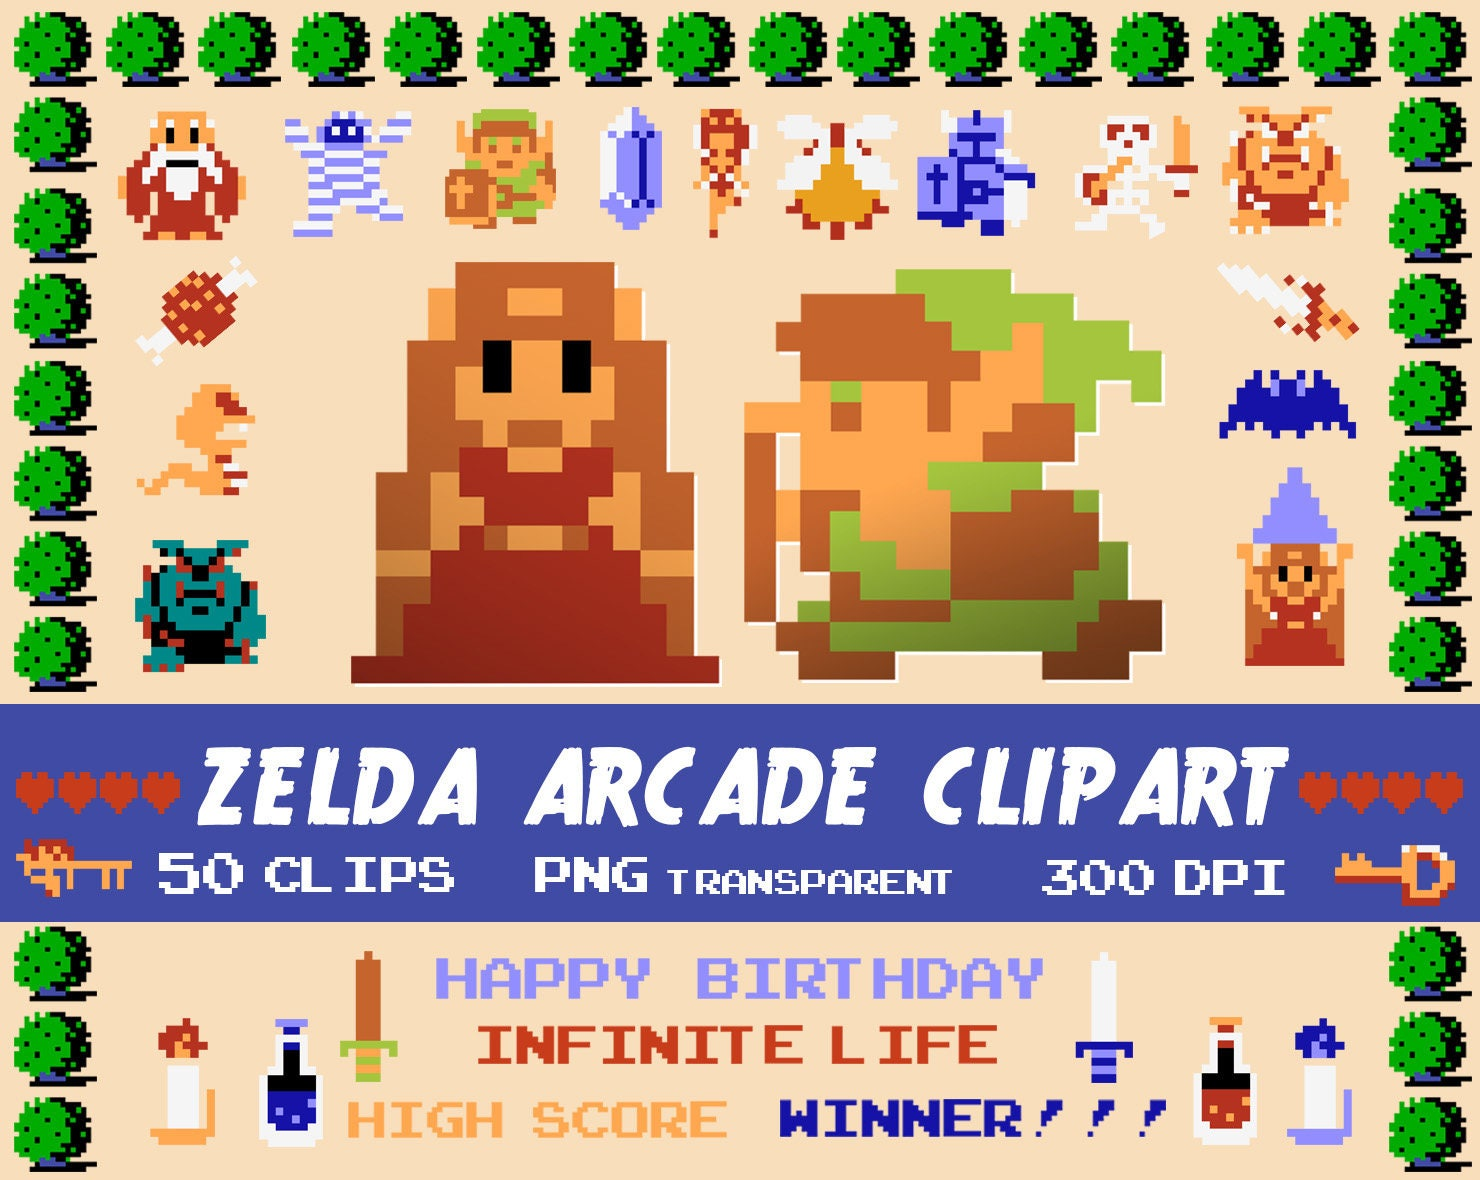 36 Legends Of Zelda Png Images Decorations Clip By